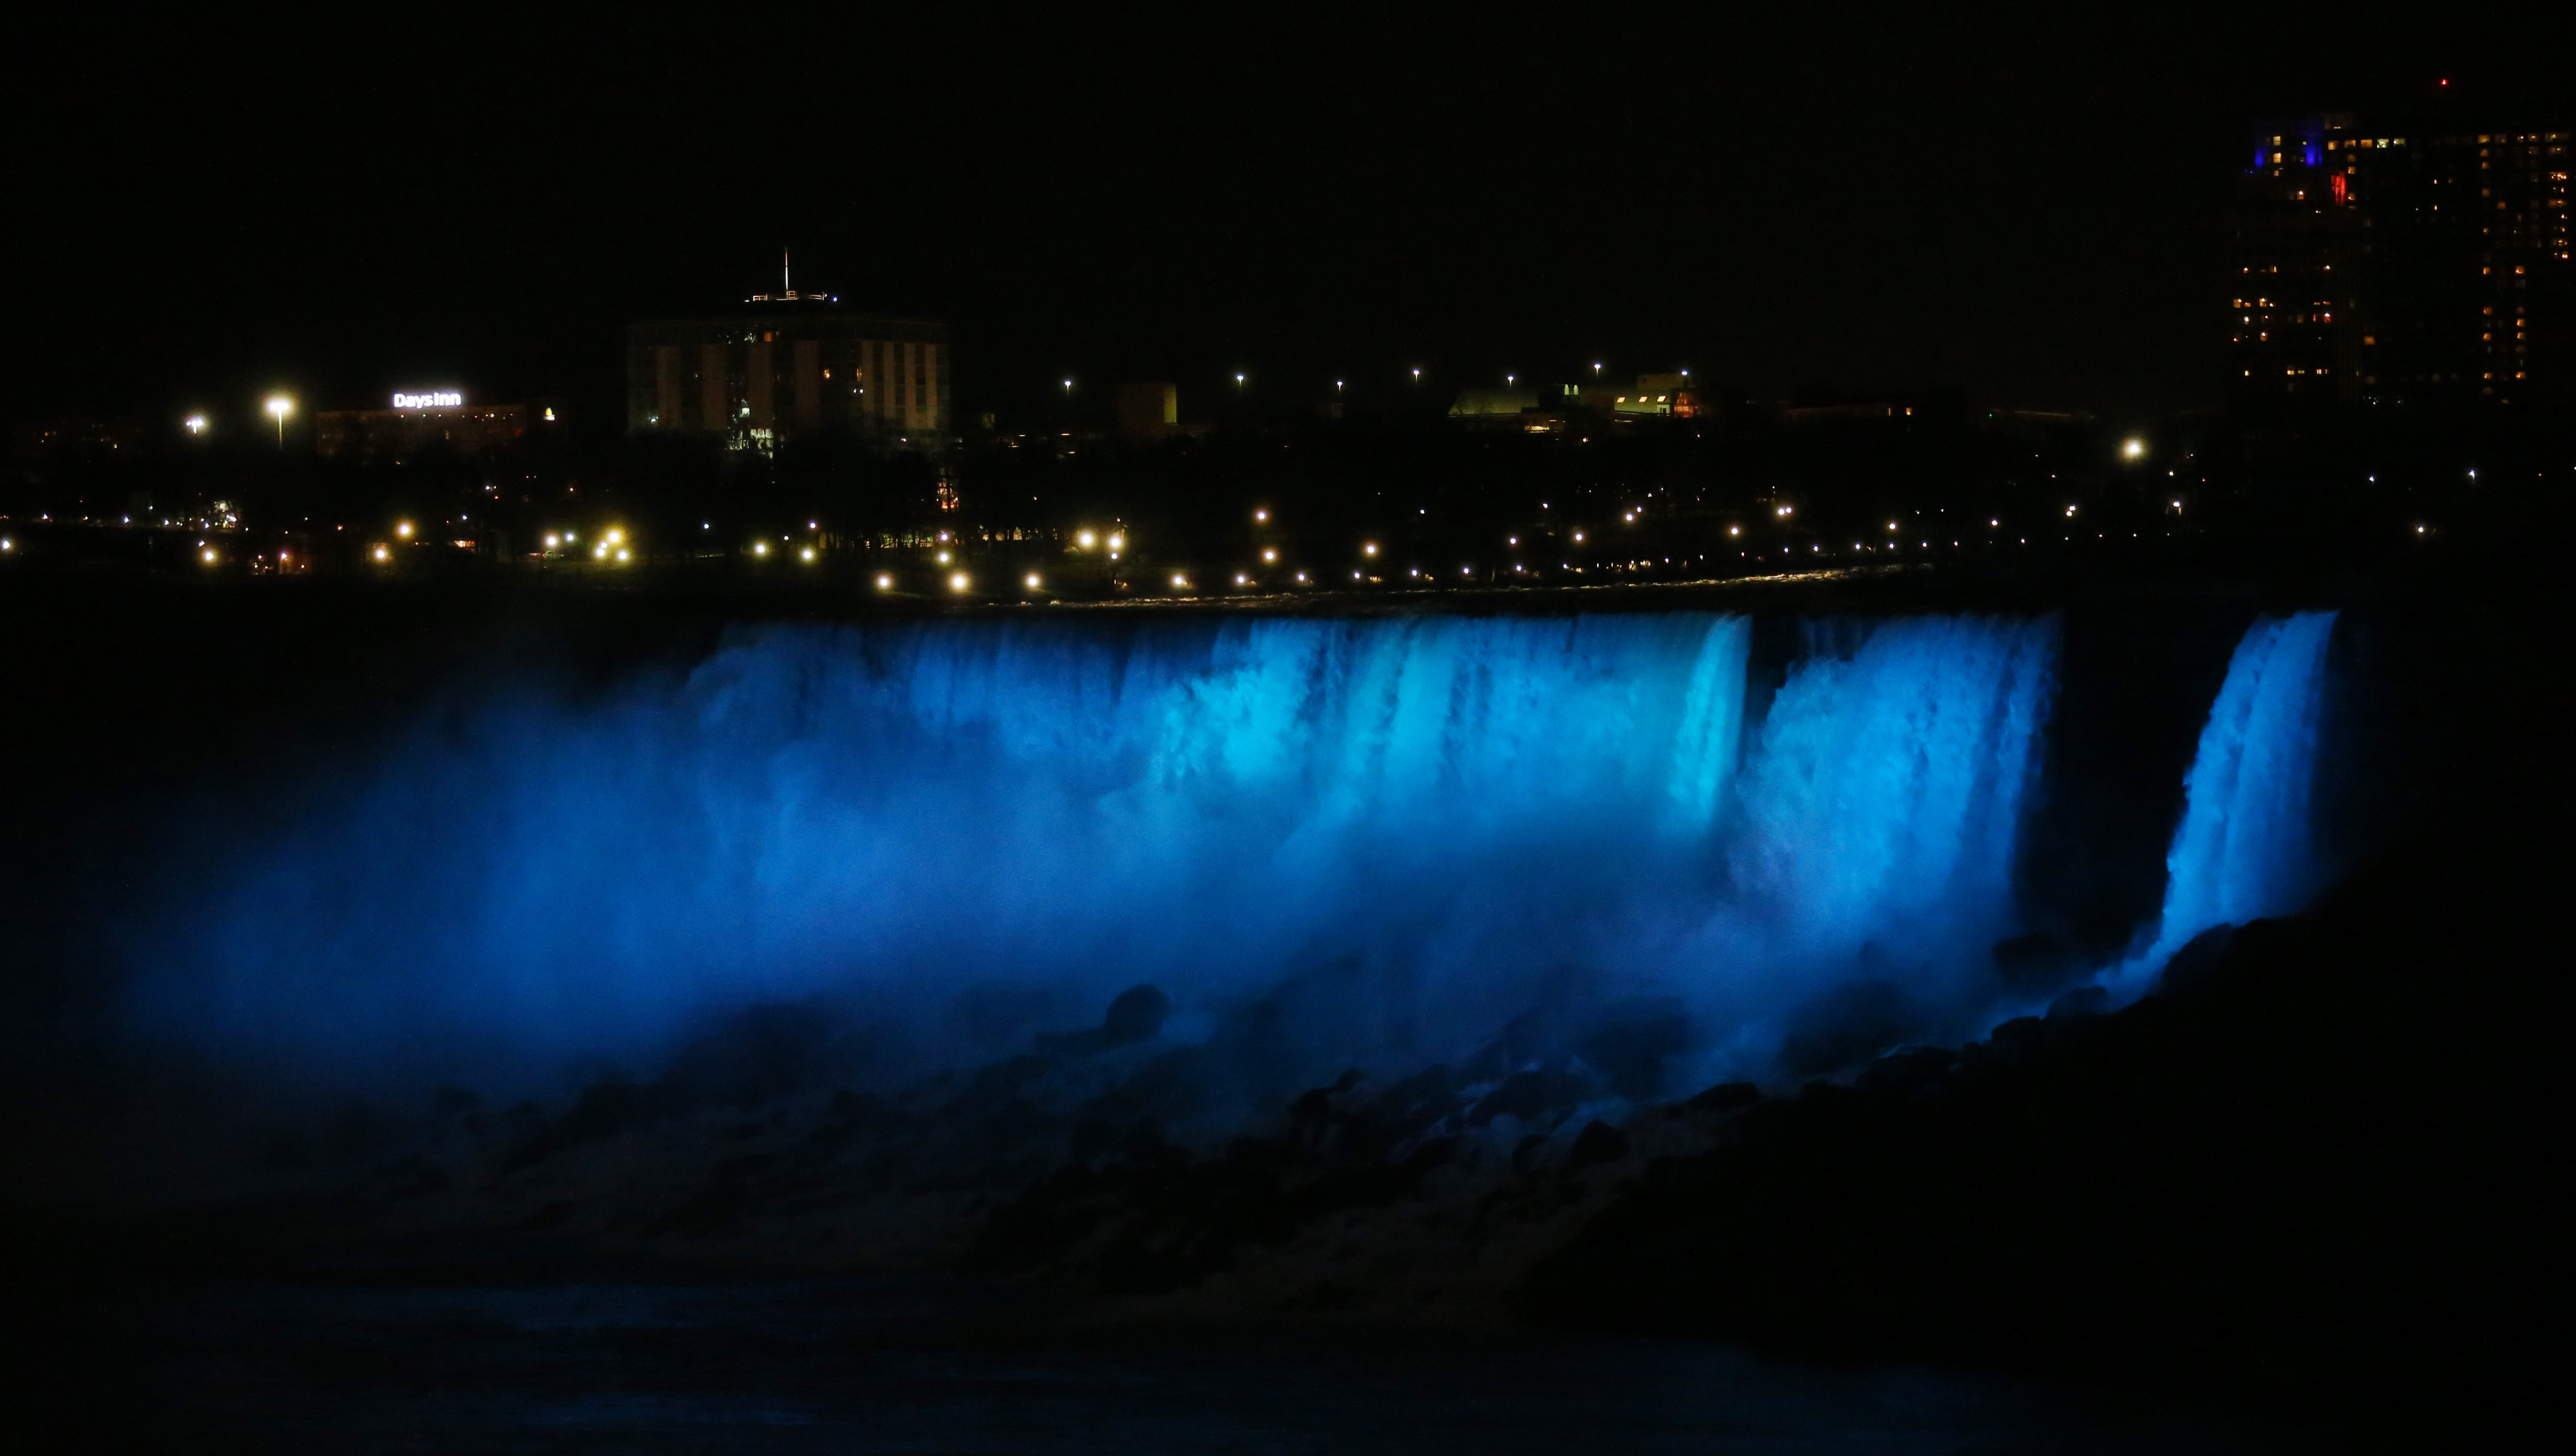 At 6:10 p.m., the Niagara Falls Illumination Board flipped the switch to turn on the new $4 million LED lighting, Thursday, Dec. 1, 2016. (Sharon Cantillon/Buffalo News)